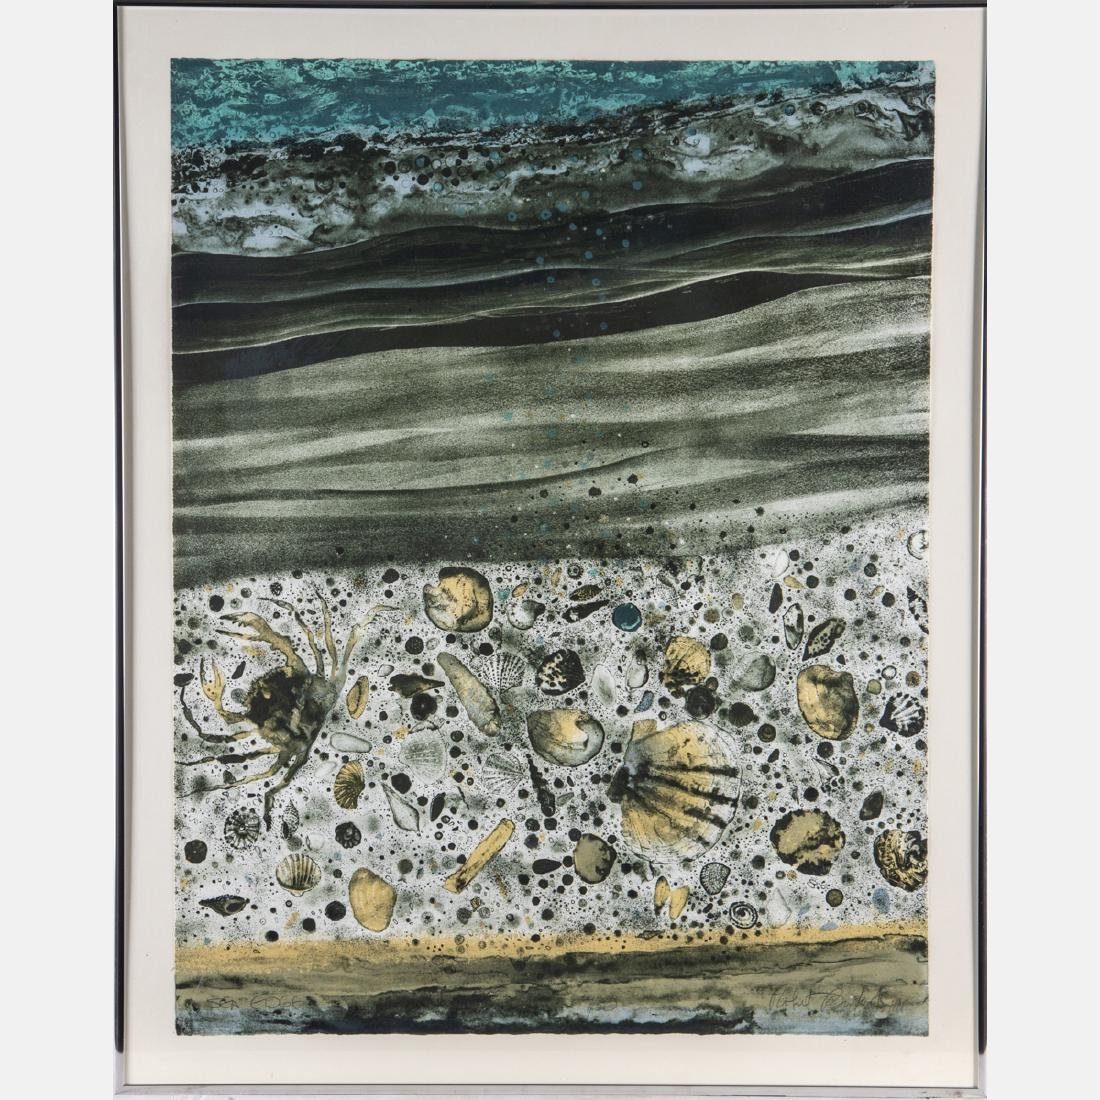 Robert Randall Burkert (b. 1930) 'Sea Edge' and 'Shore - 8